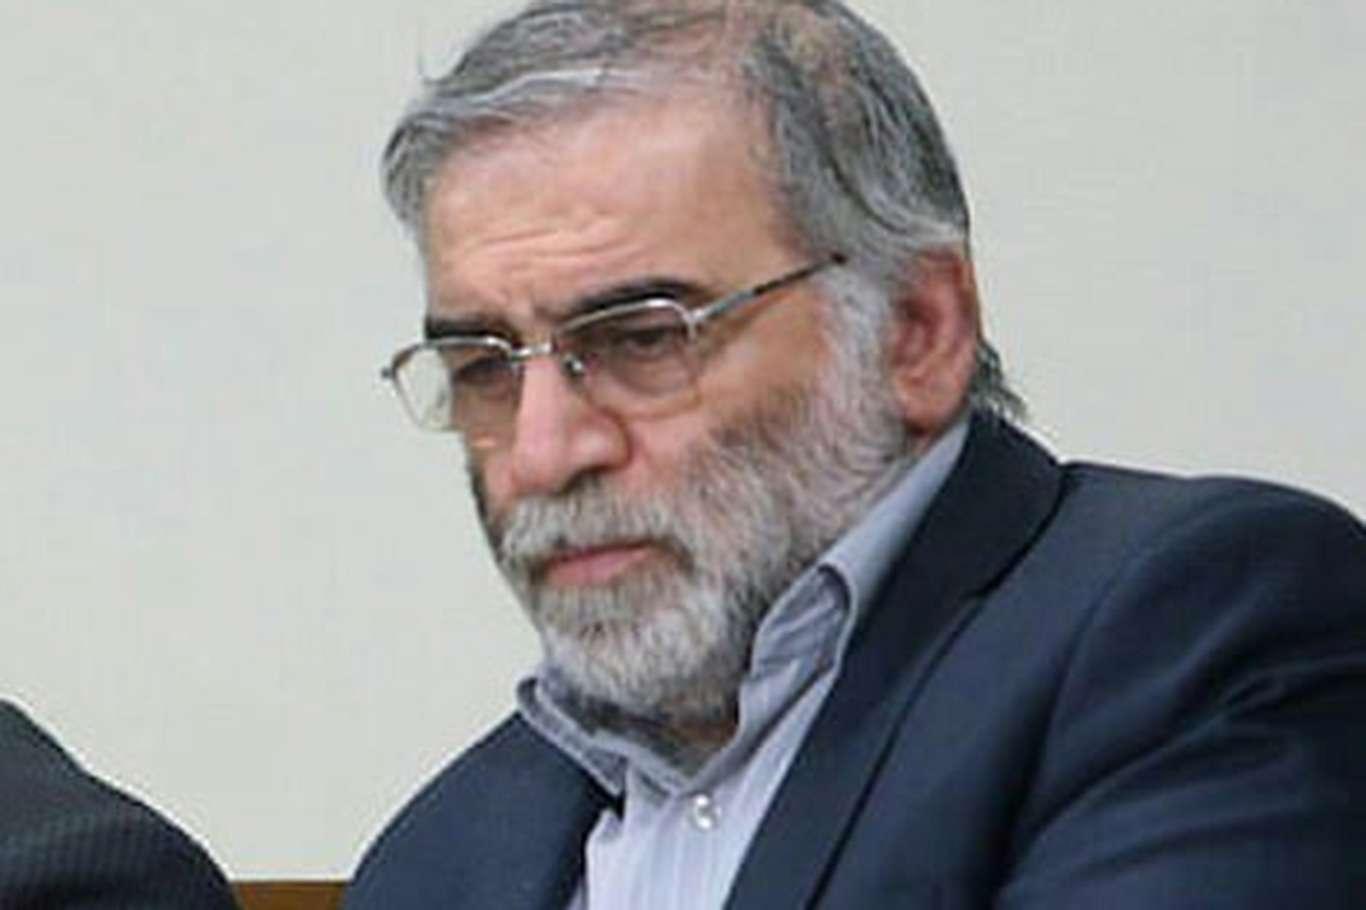 Suikasta uğrayan İranlı bilim adamının öldüğü doğrulandı